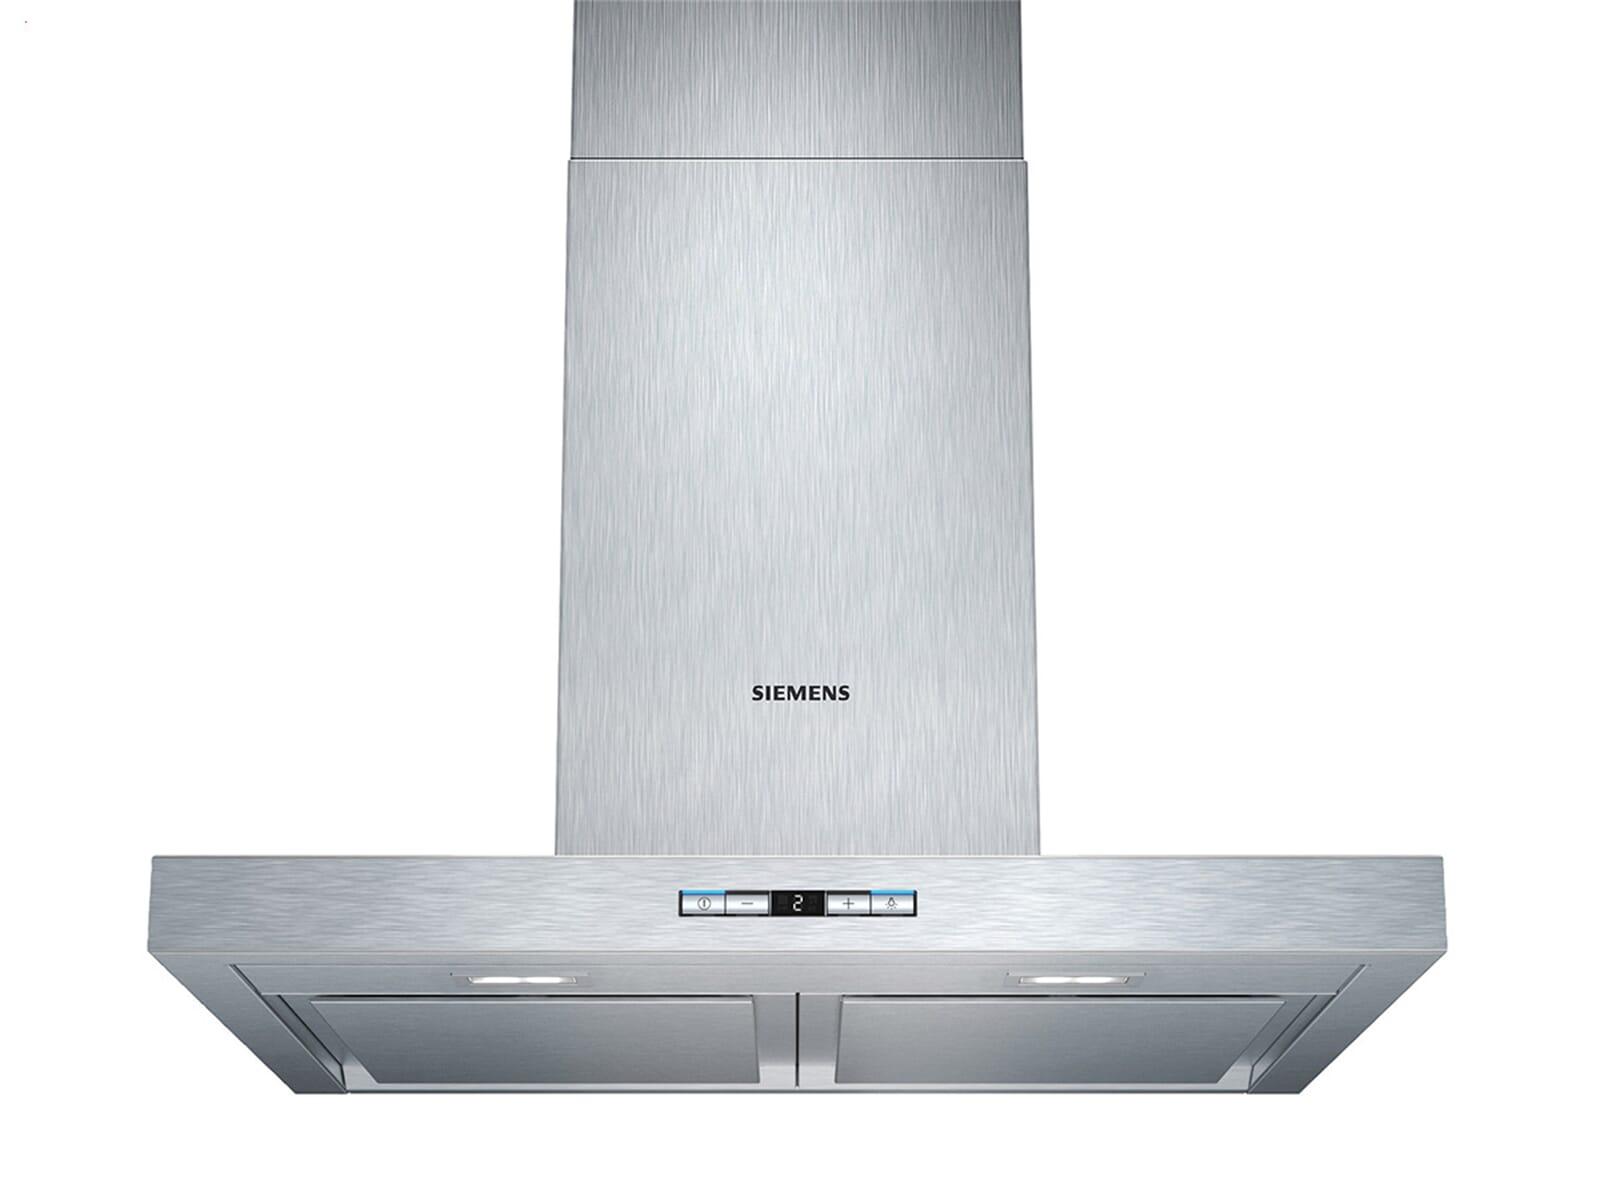 Siemens lc68bc542 wand dunstabzugshaube edelstahl f r 544 - Wand dunstabzugshauben ...